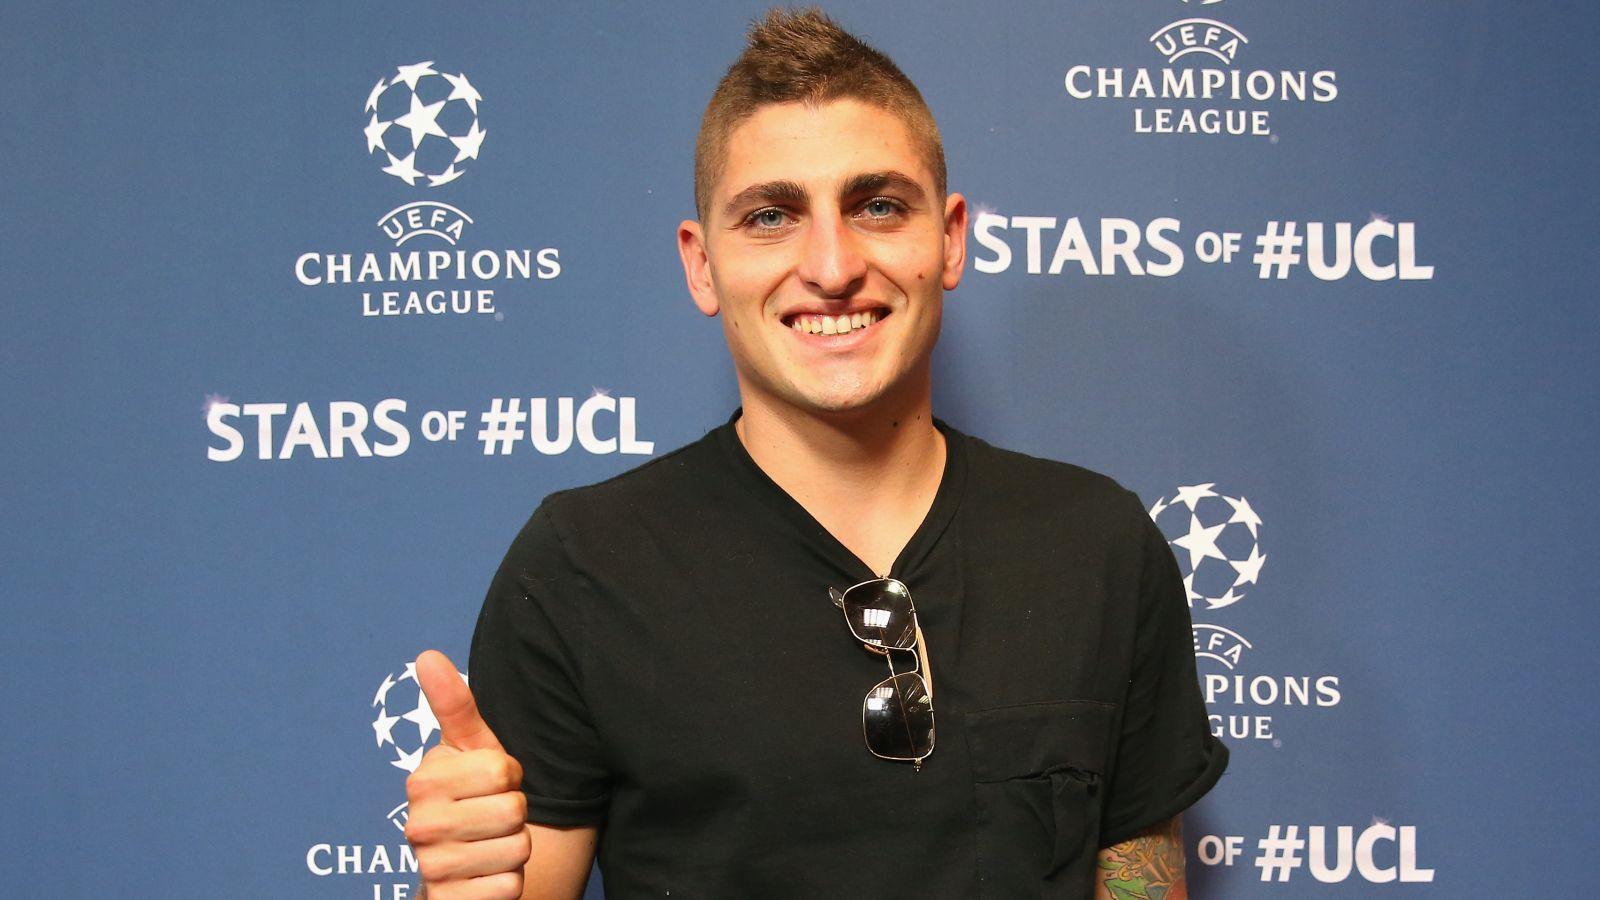 Man United set to make offer for PSG midfielder Verratti